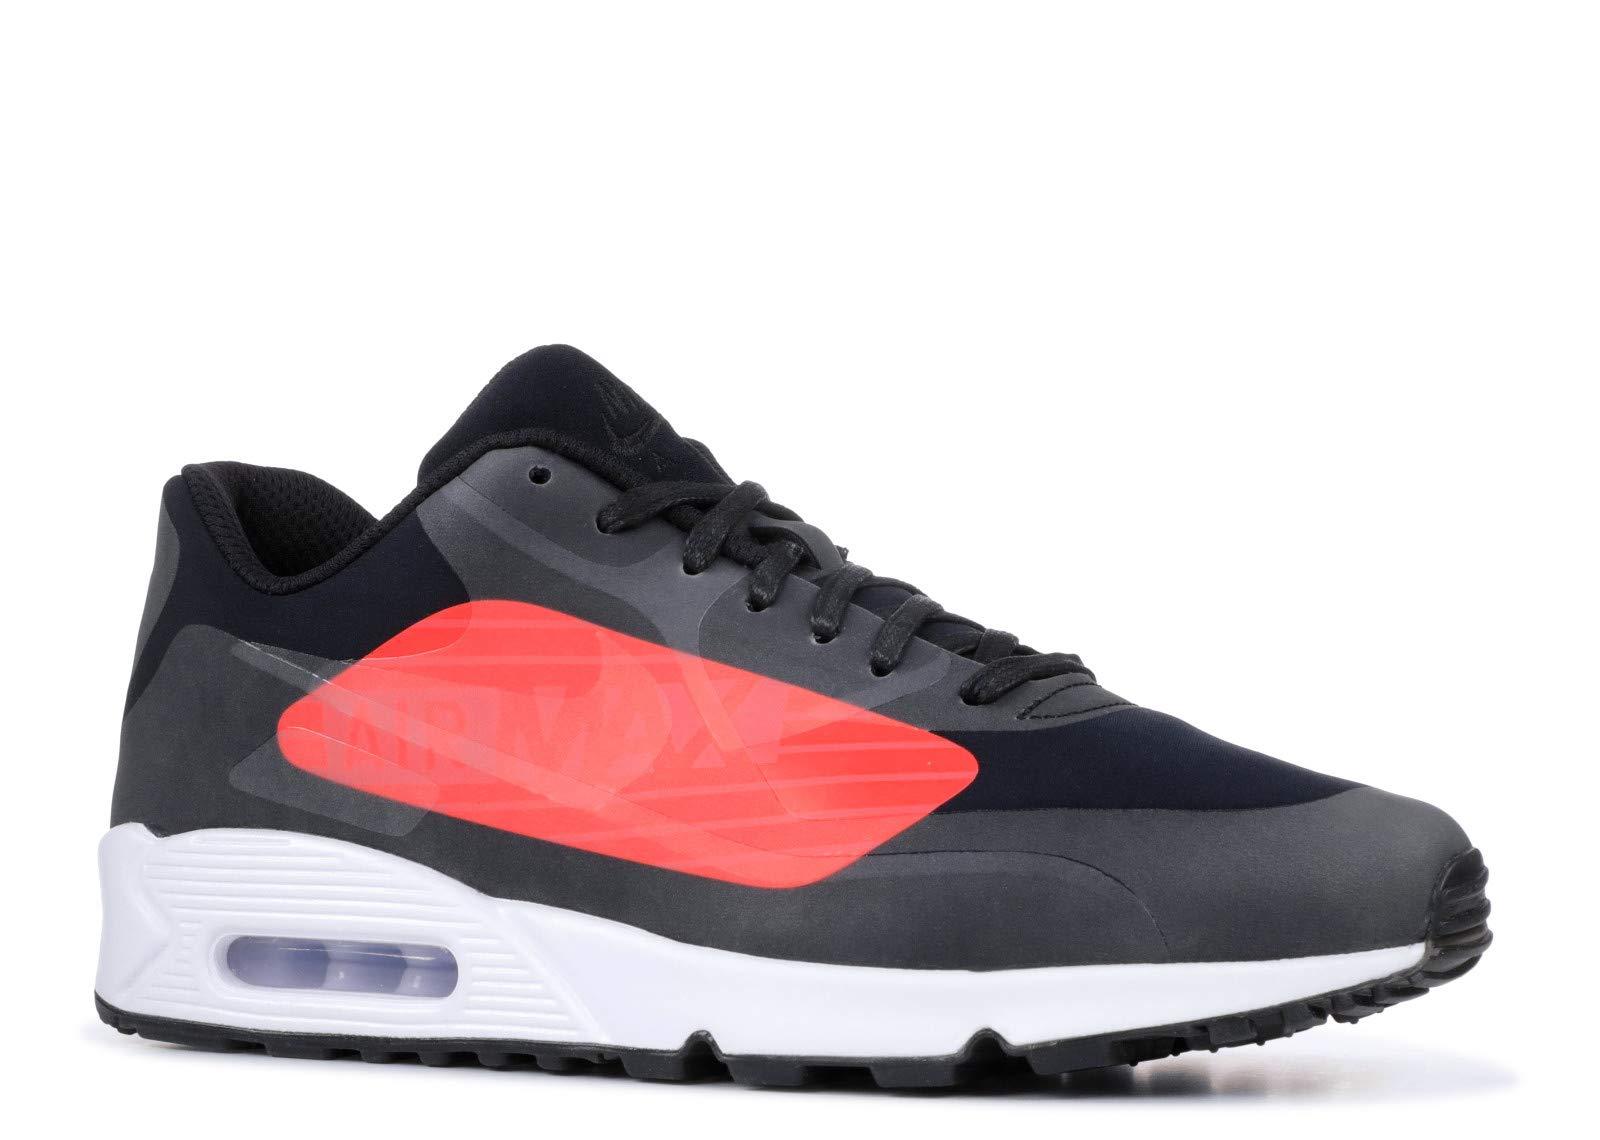 san francisco 544cf 06e66 Galleon - NIKE Air Max 90 NS GPX Big Logo Men s Sneaker (10.5 D(M) US)